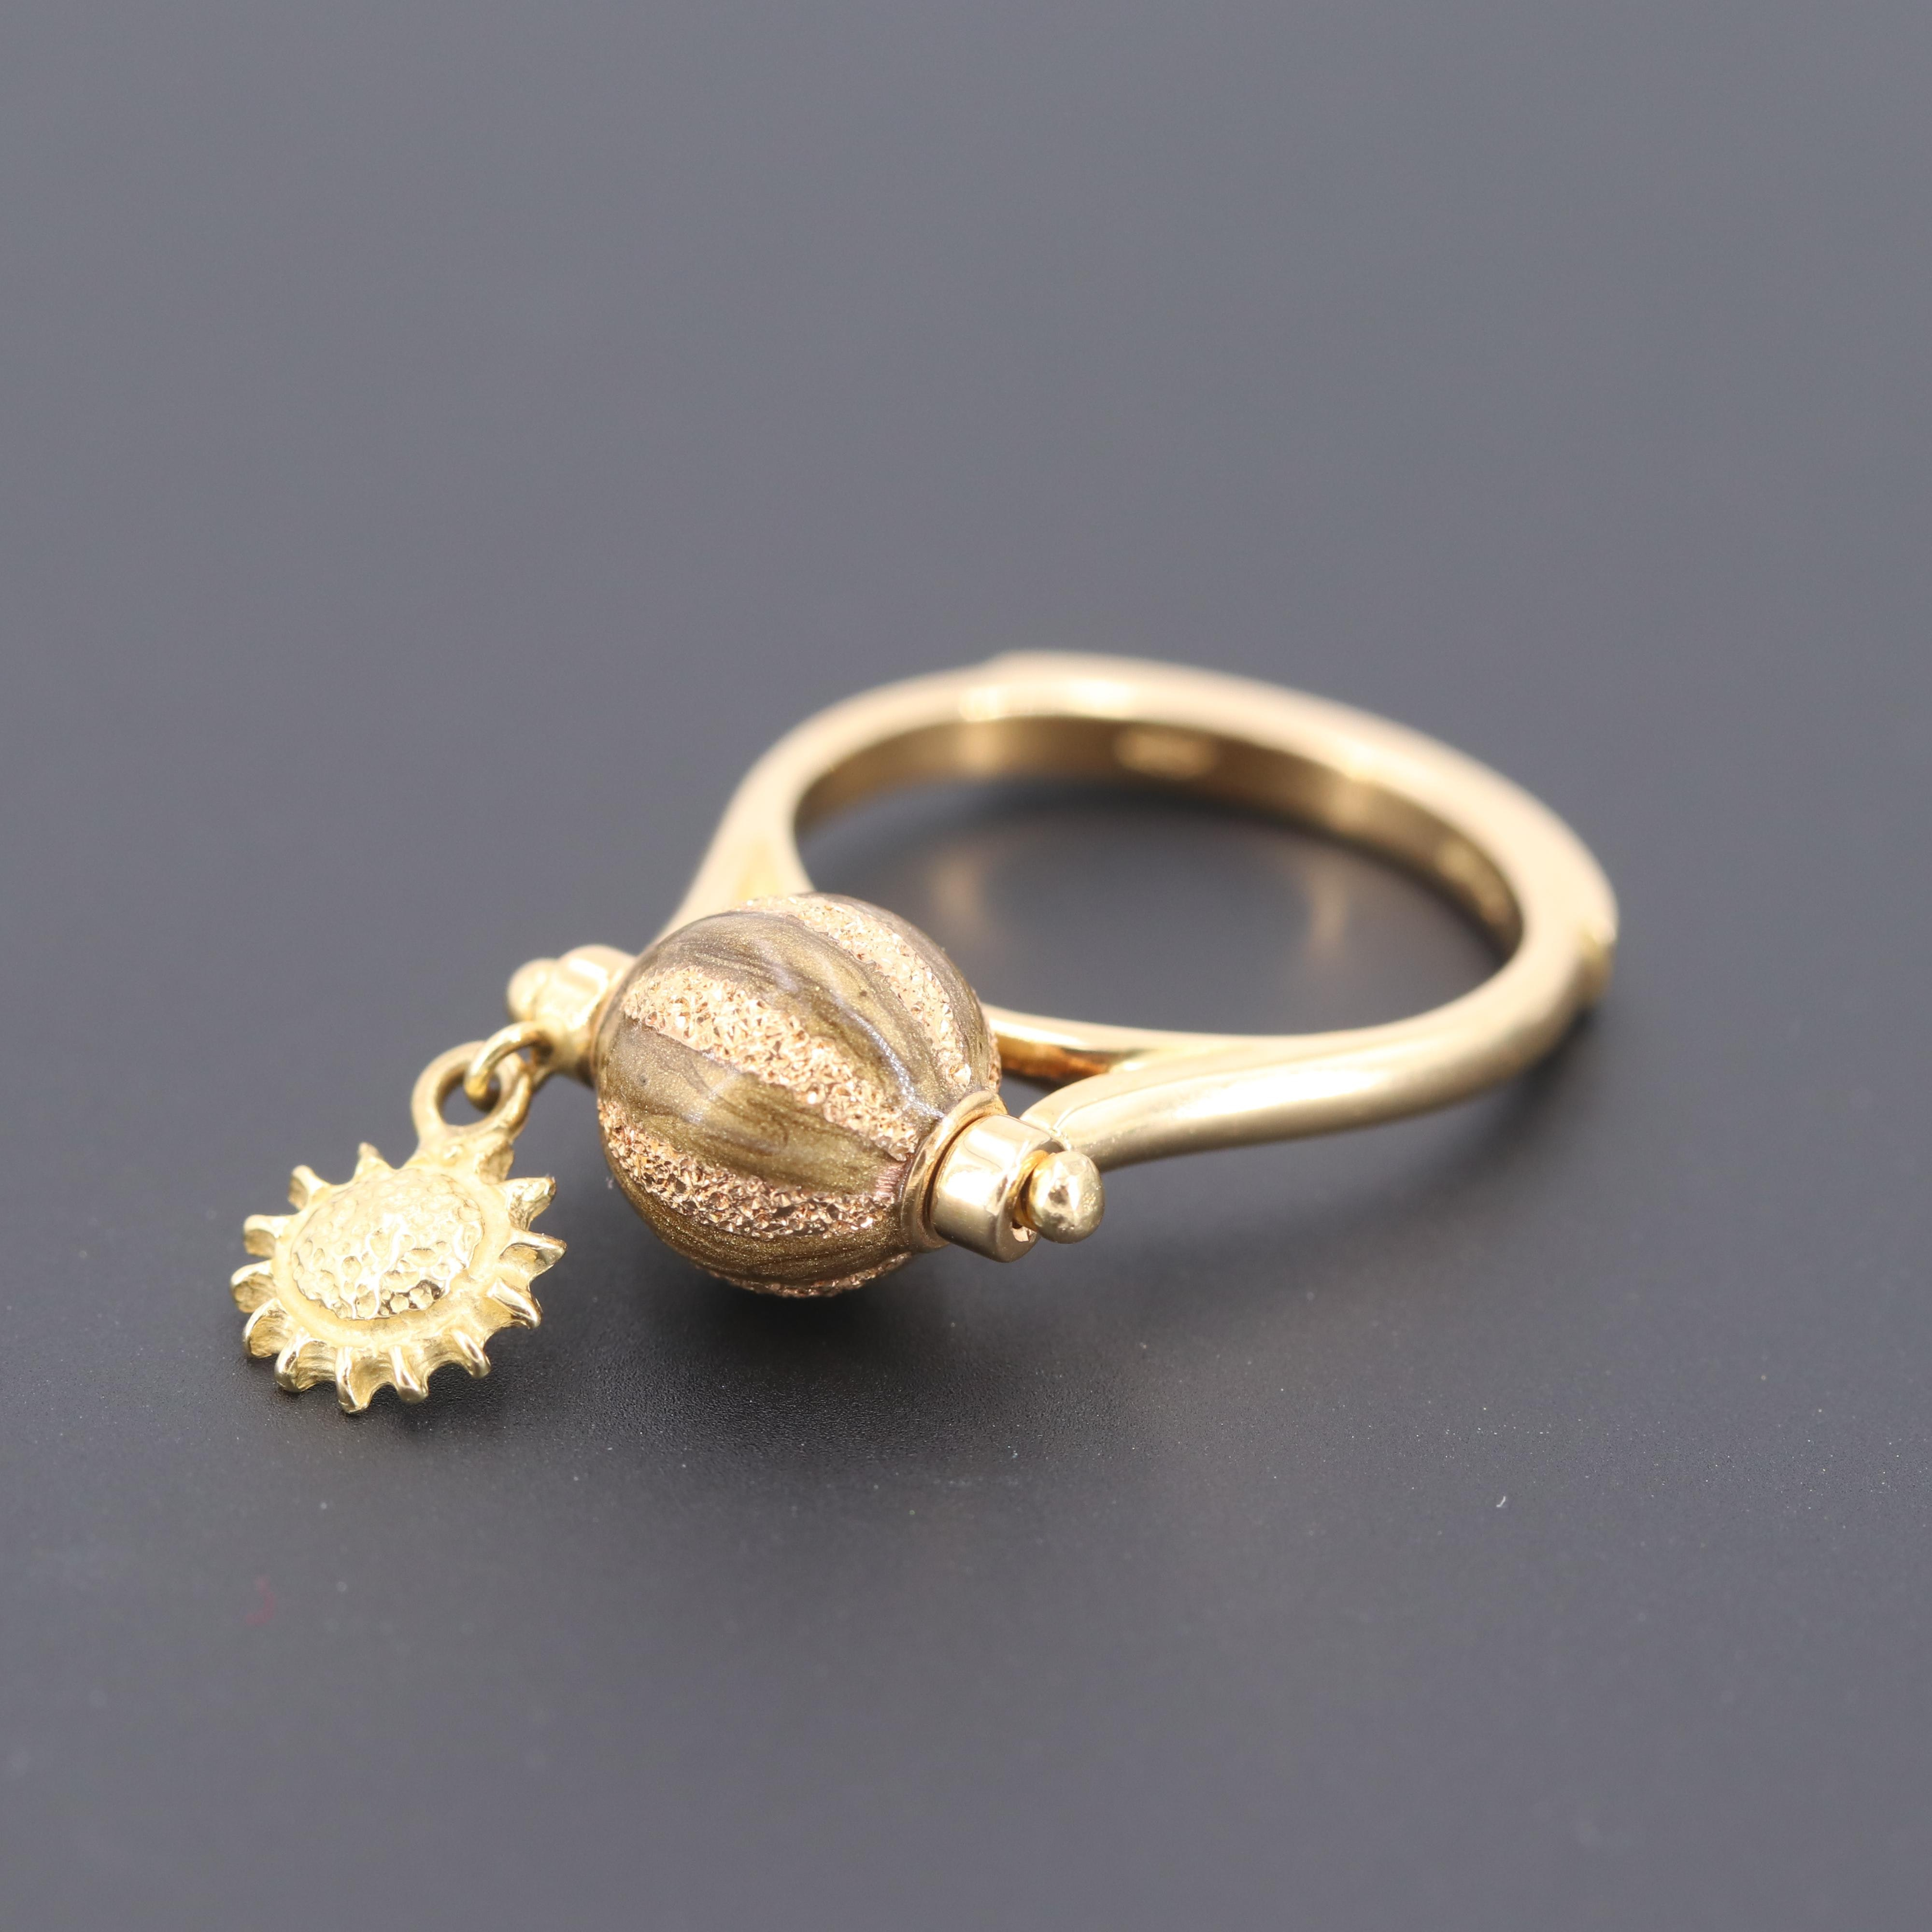 Carolina Bucci 18K Yellow Gold Enamel Articualted Ring